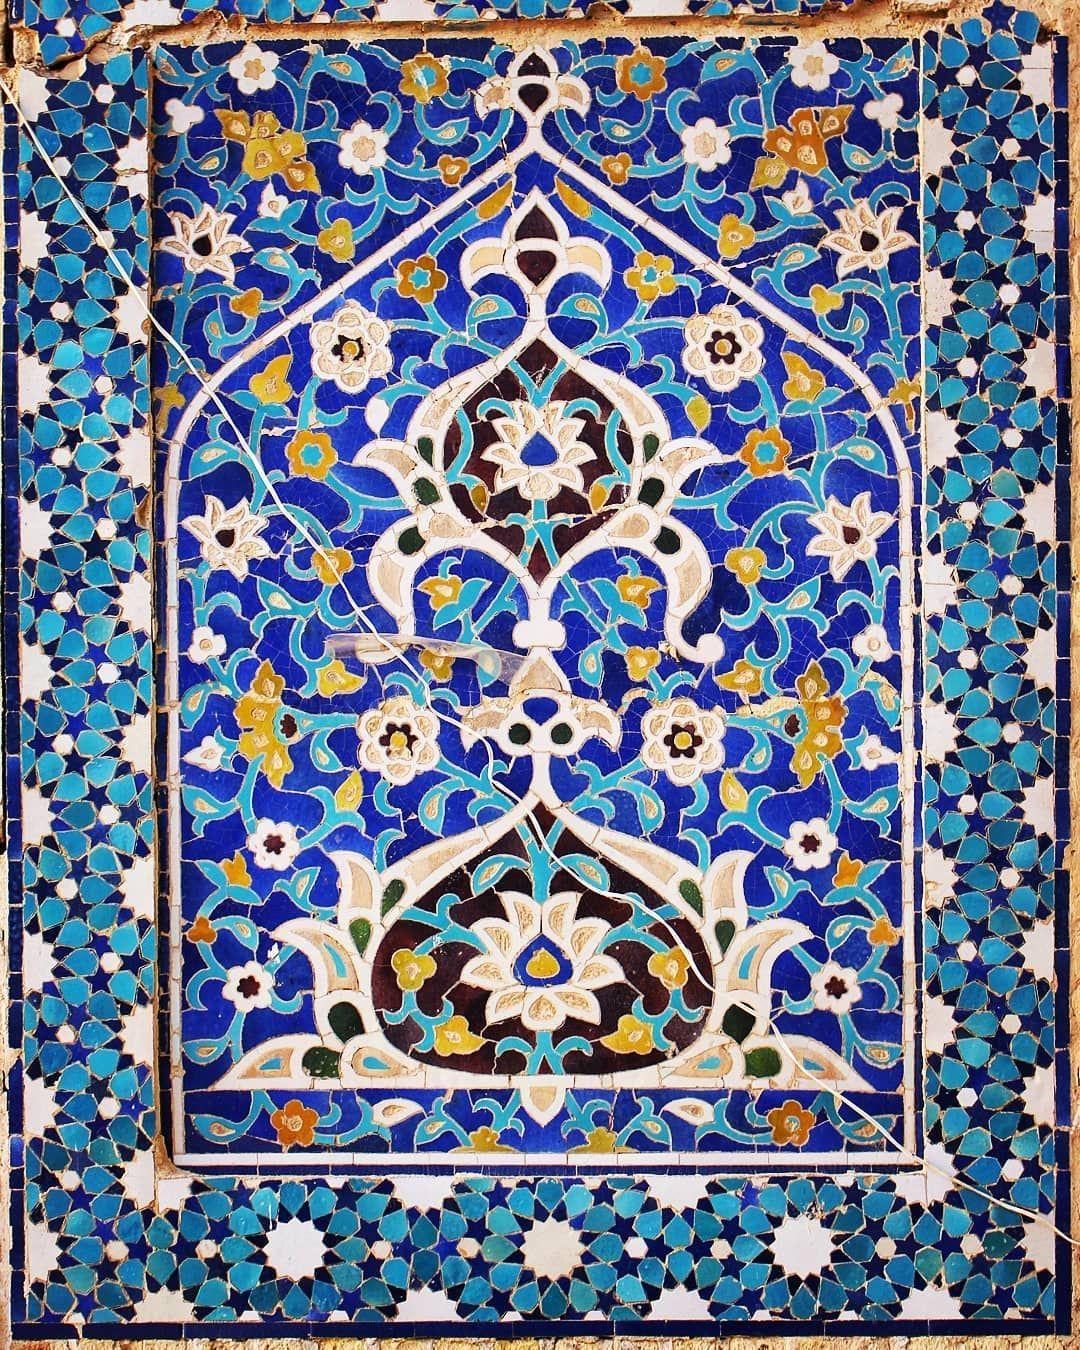 Islamic Art Gallery On Instagram Iranian Mosaic Tiles Jameh Mosque Of Varzaneh تزئینات کاشی معرق مسجد جامع ورزنه Islamicart Mosaic Tiles Islamic Art Mosaic